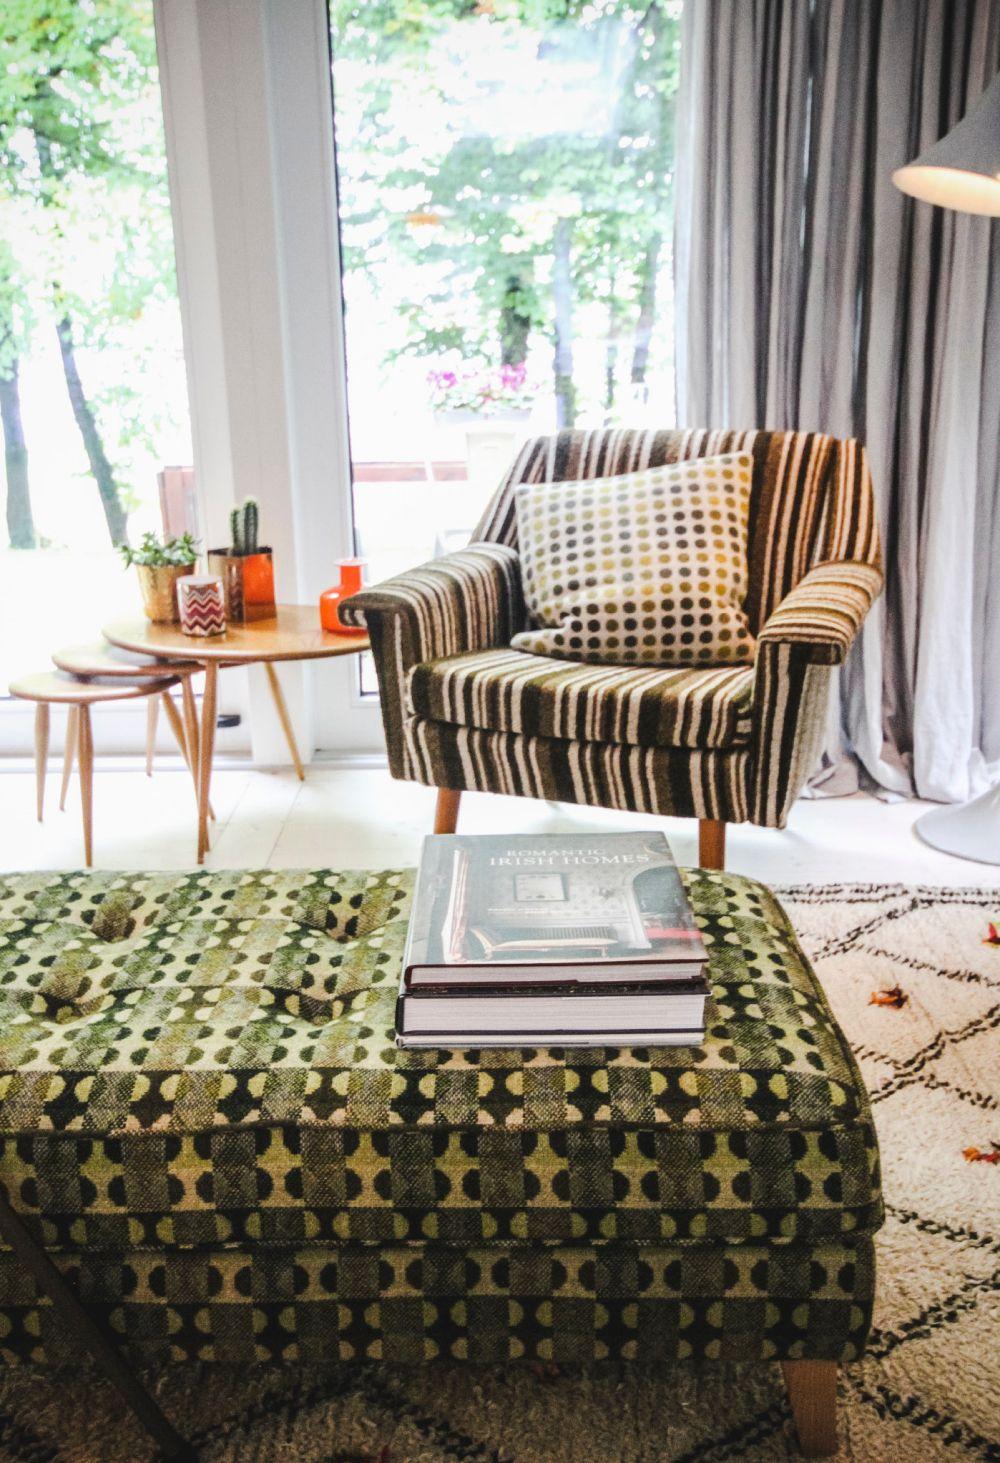 adelaparvu-com-despre-cabana-in-padure-decorata-in-stilul-anilor-60-designer-egon-walesch-foto-verona-photography-10